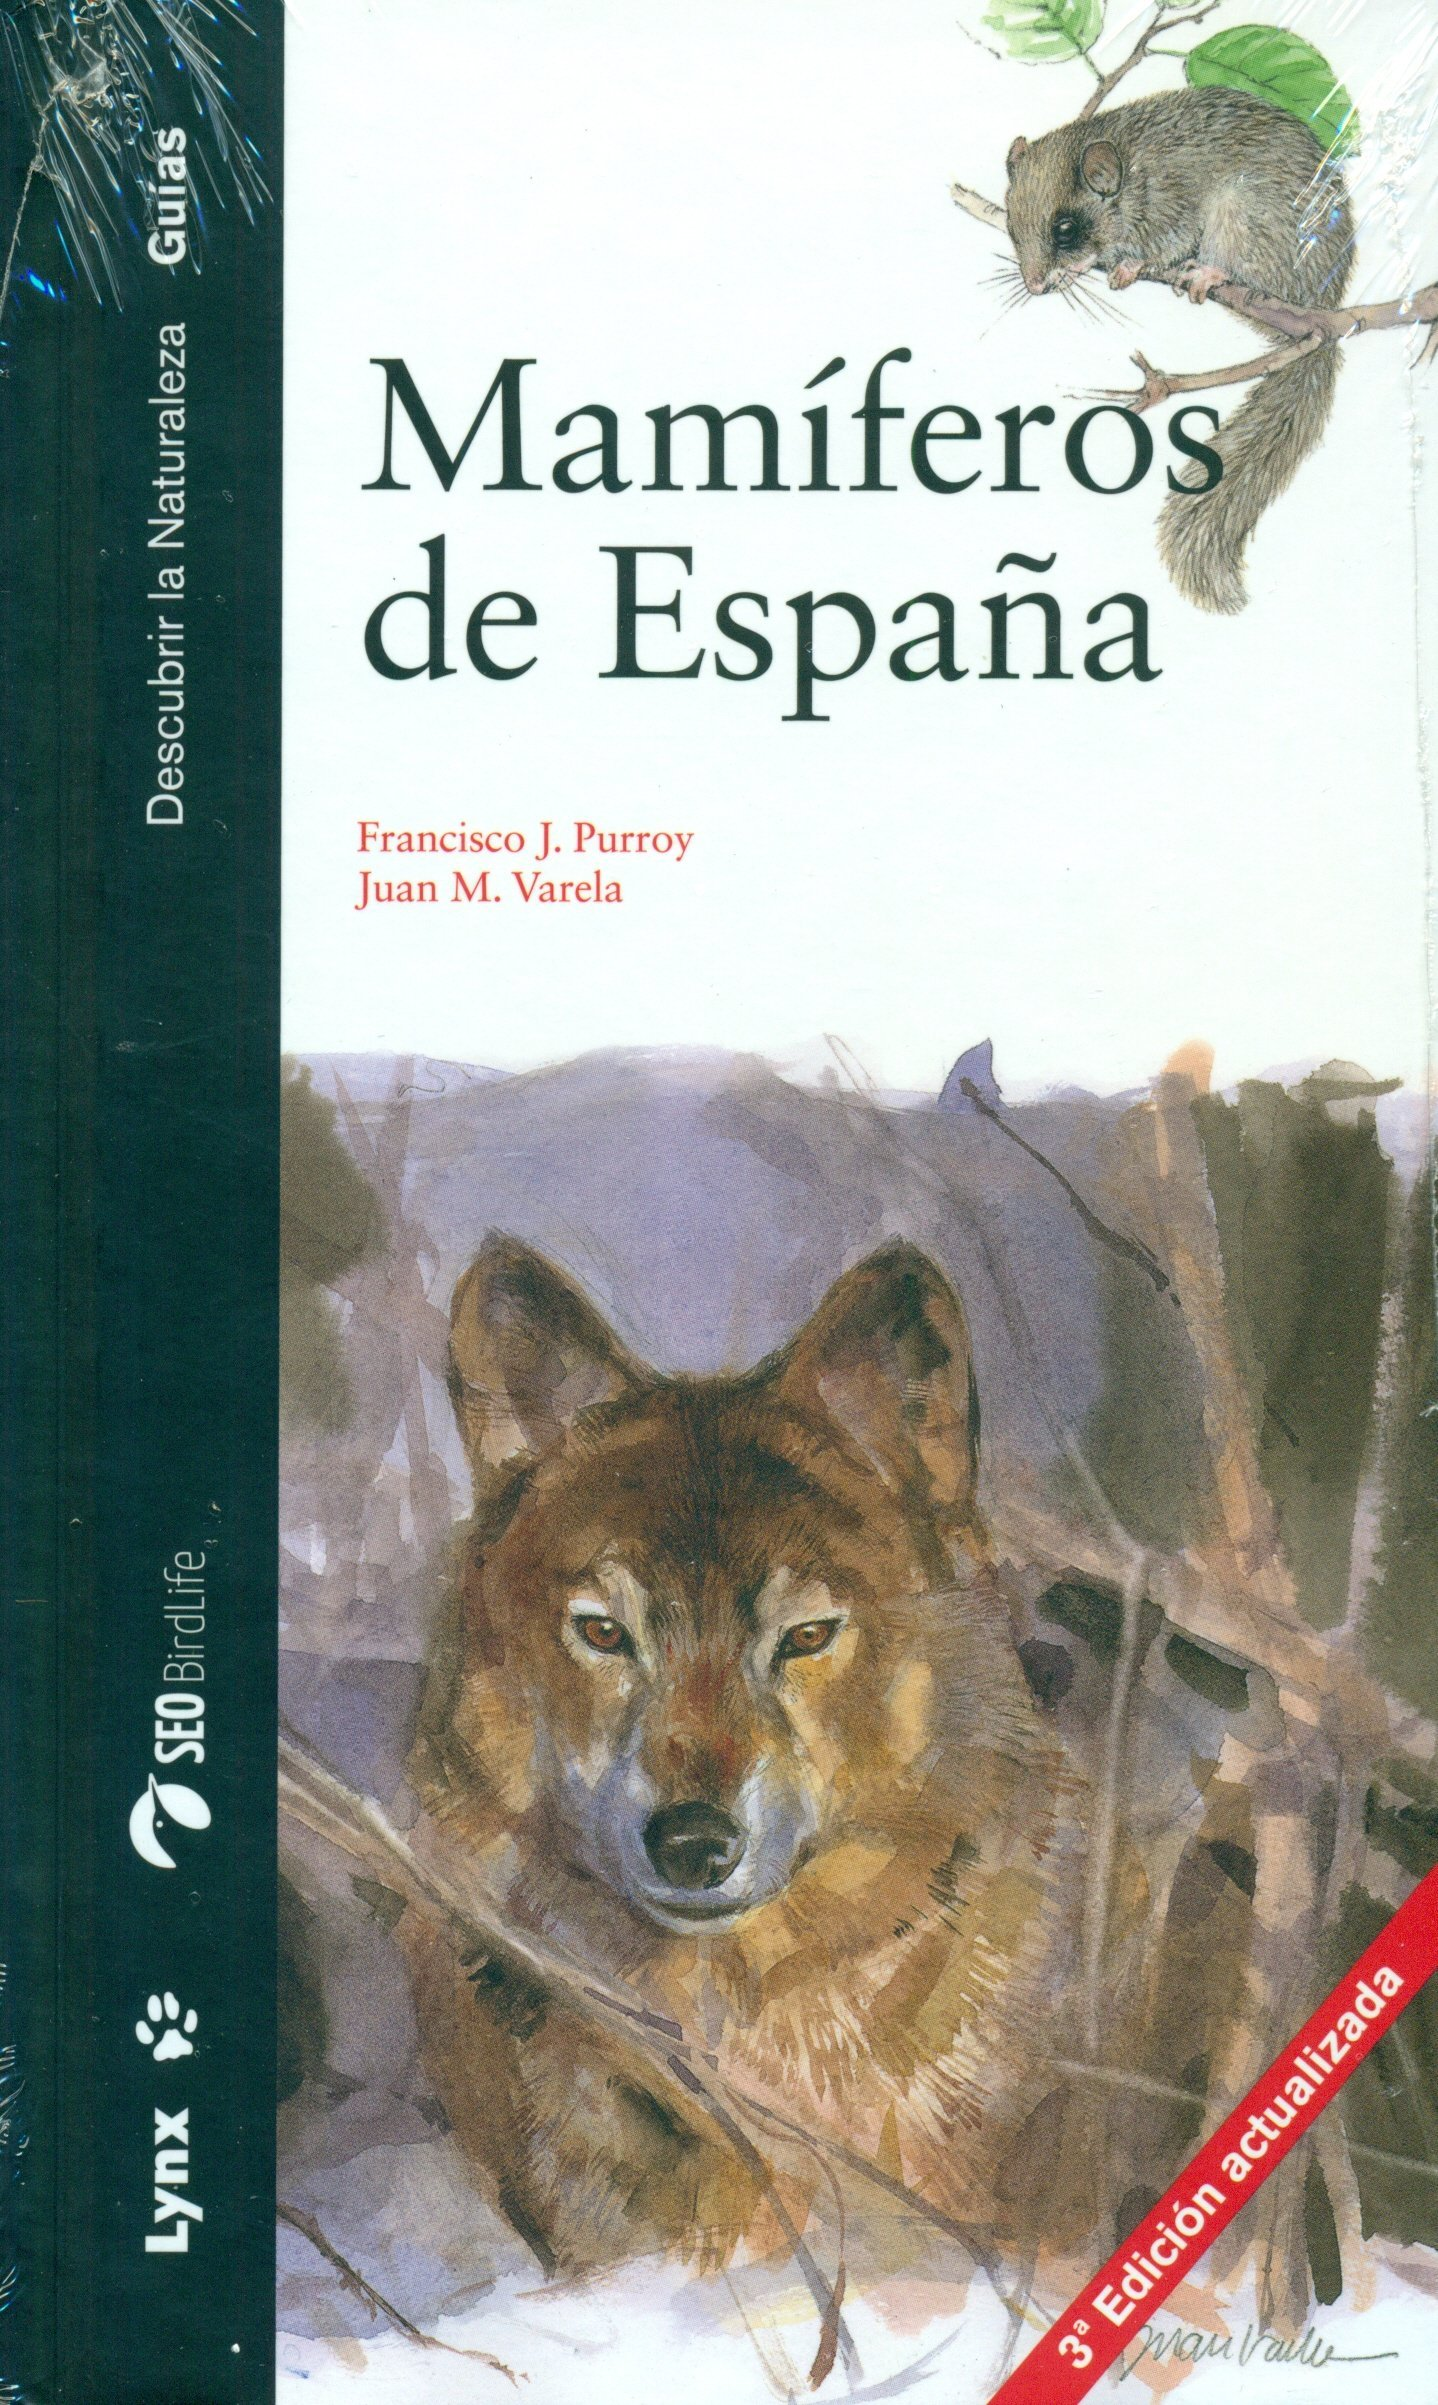 Mamíferos de España (Descubrir la Naturaleza. Guías): Amazon.es: Purroy, Francisco J., Varela, Juan M.: Libros